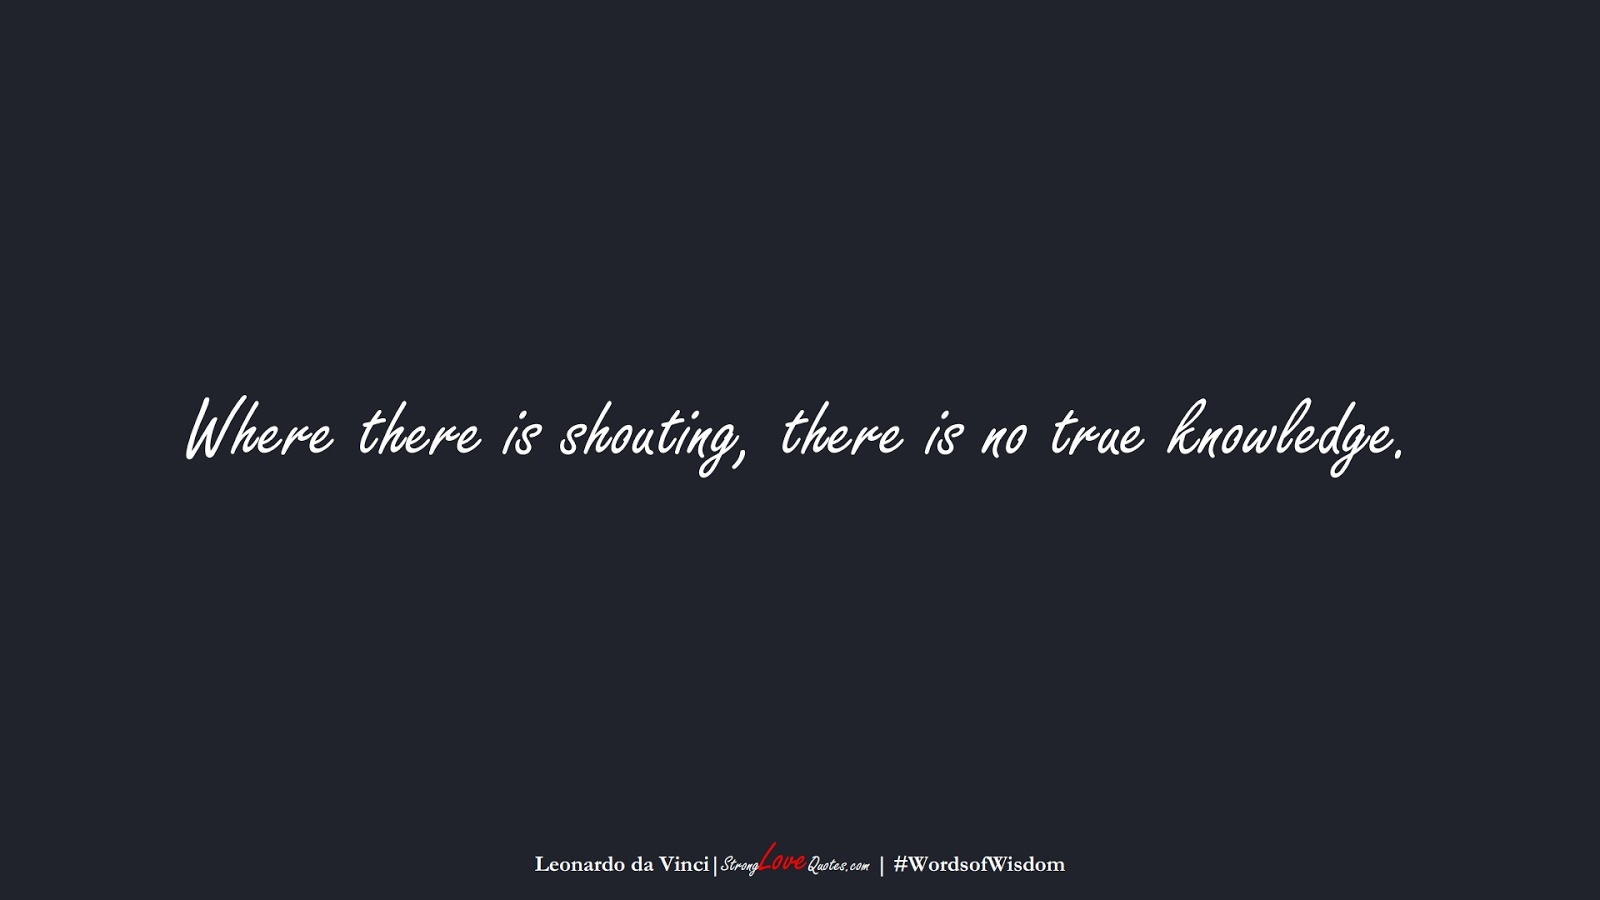 Where there is shouting, there is no true knowledge. (Leonardo da Vinci);  #WordsofWisdom